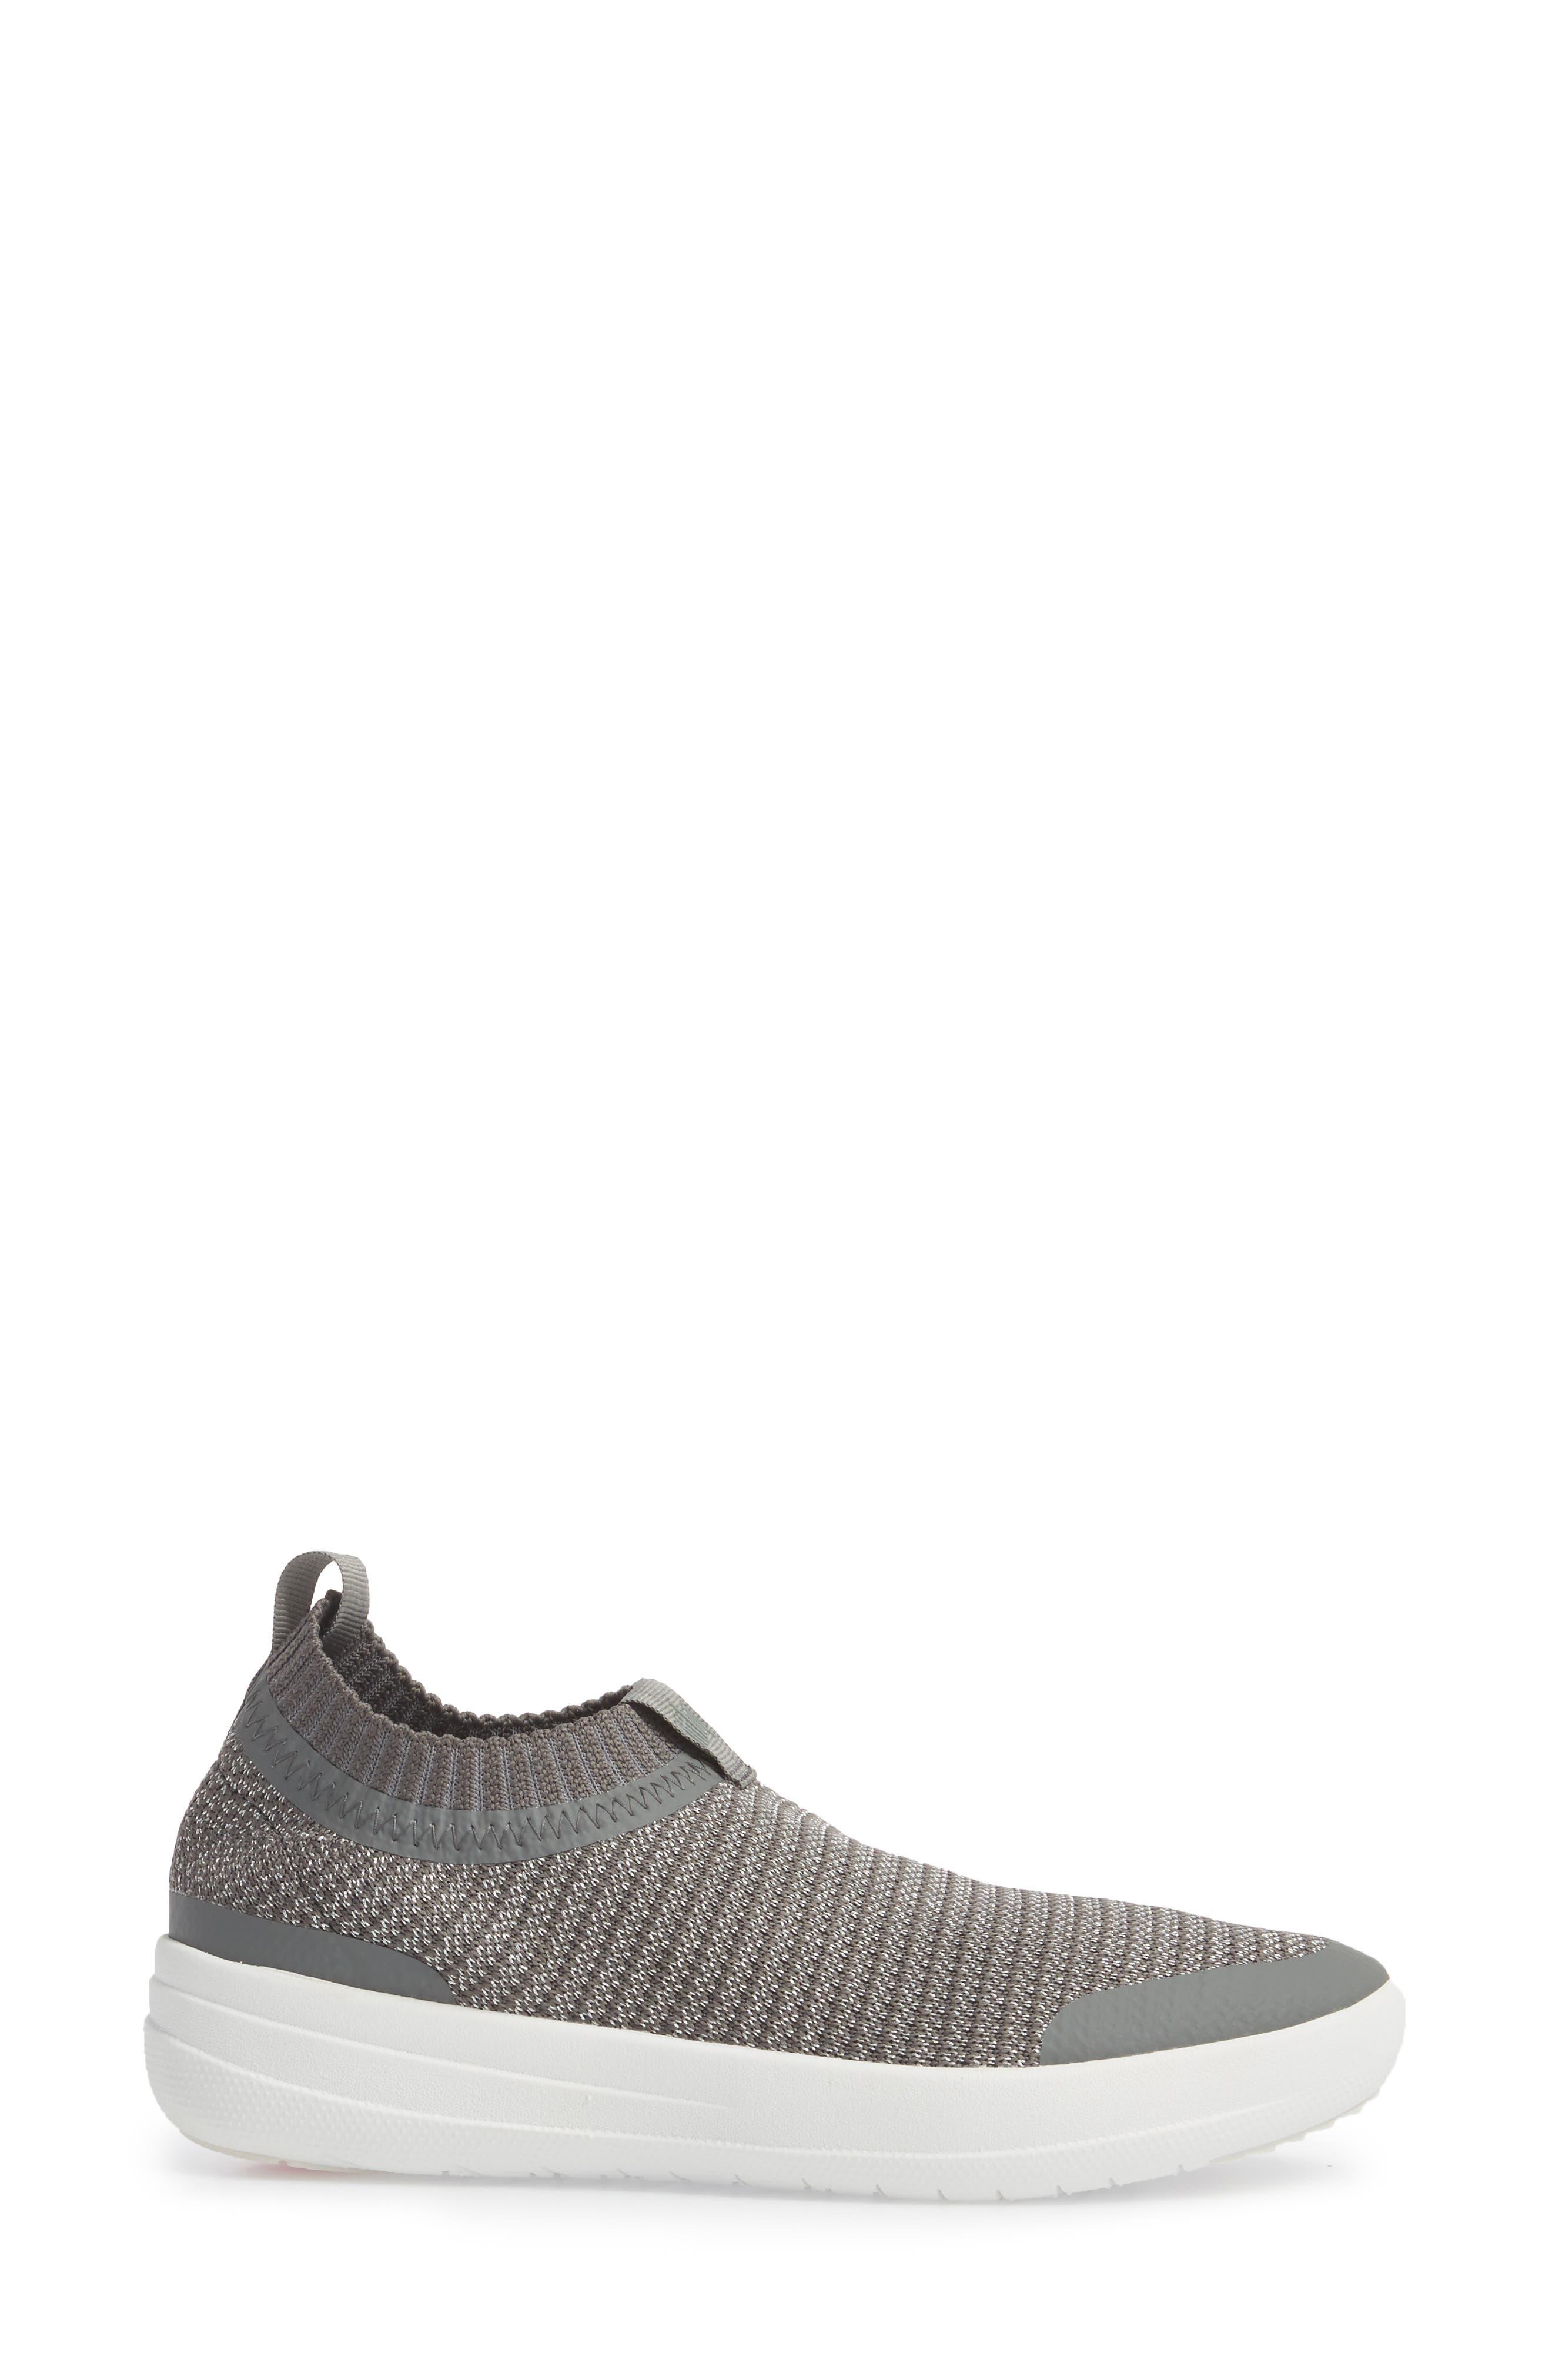 Uberknit Knit Sock Sneaker,                             Alternate thumbnail 3, color,                             CHARCOAL/ METALLIC PEWTER